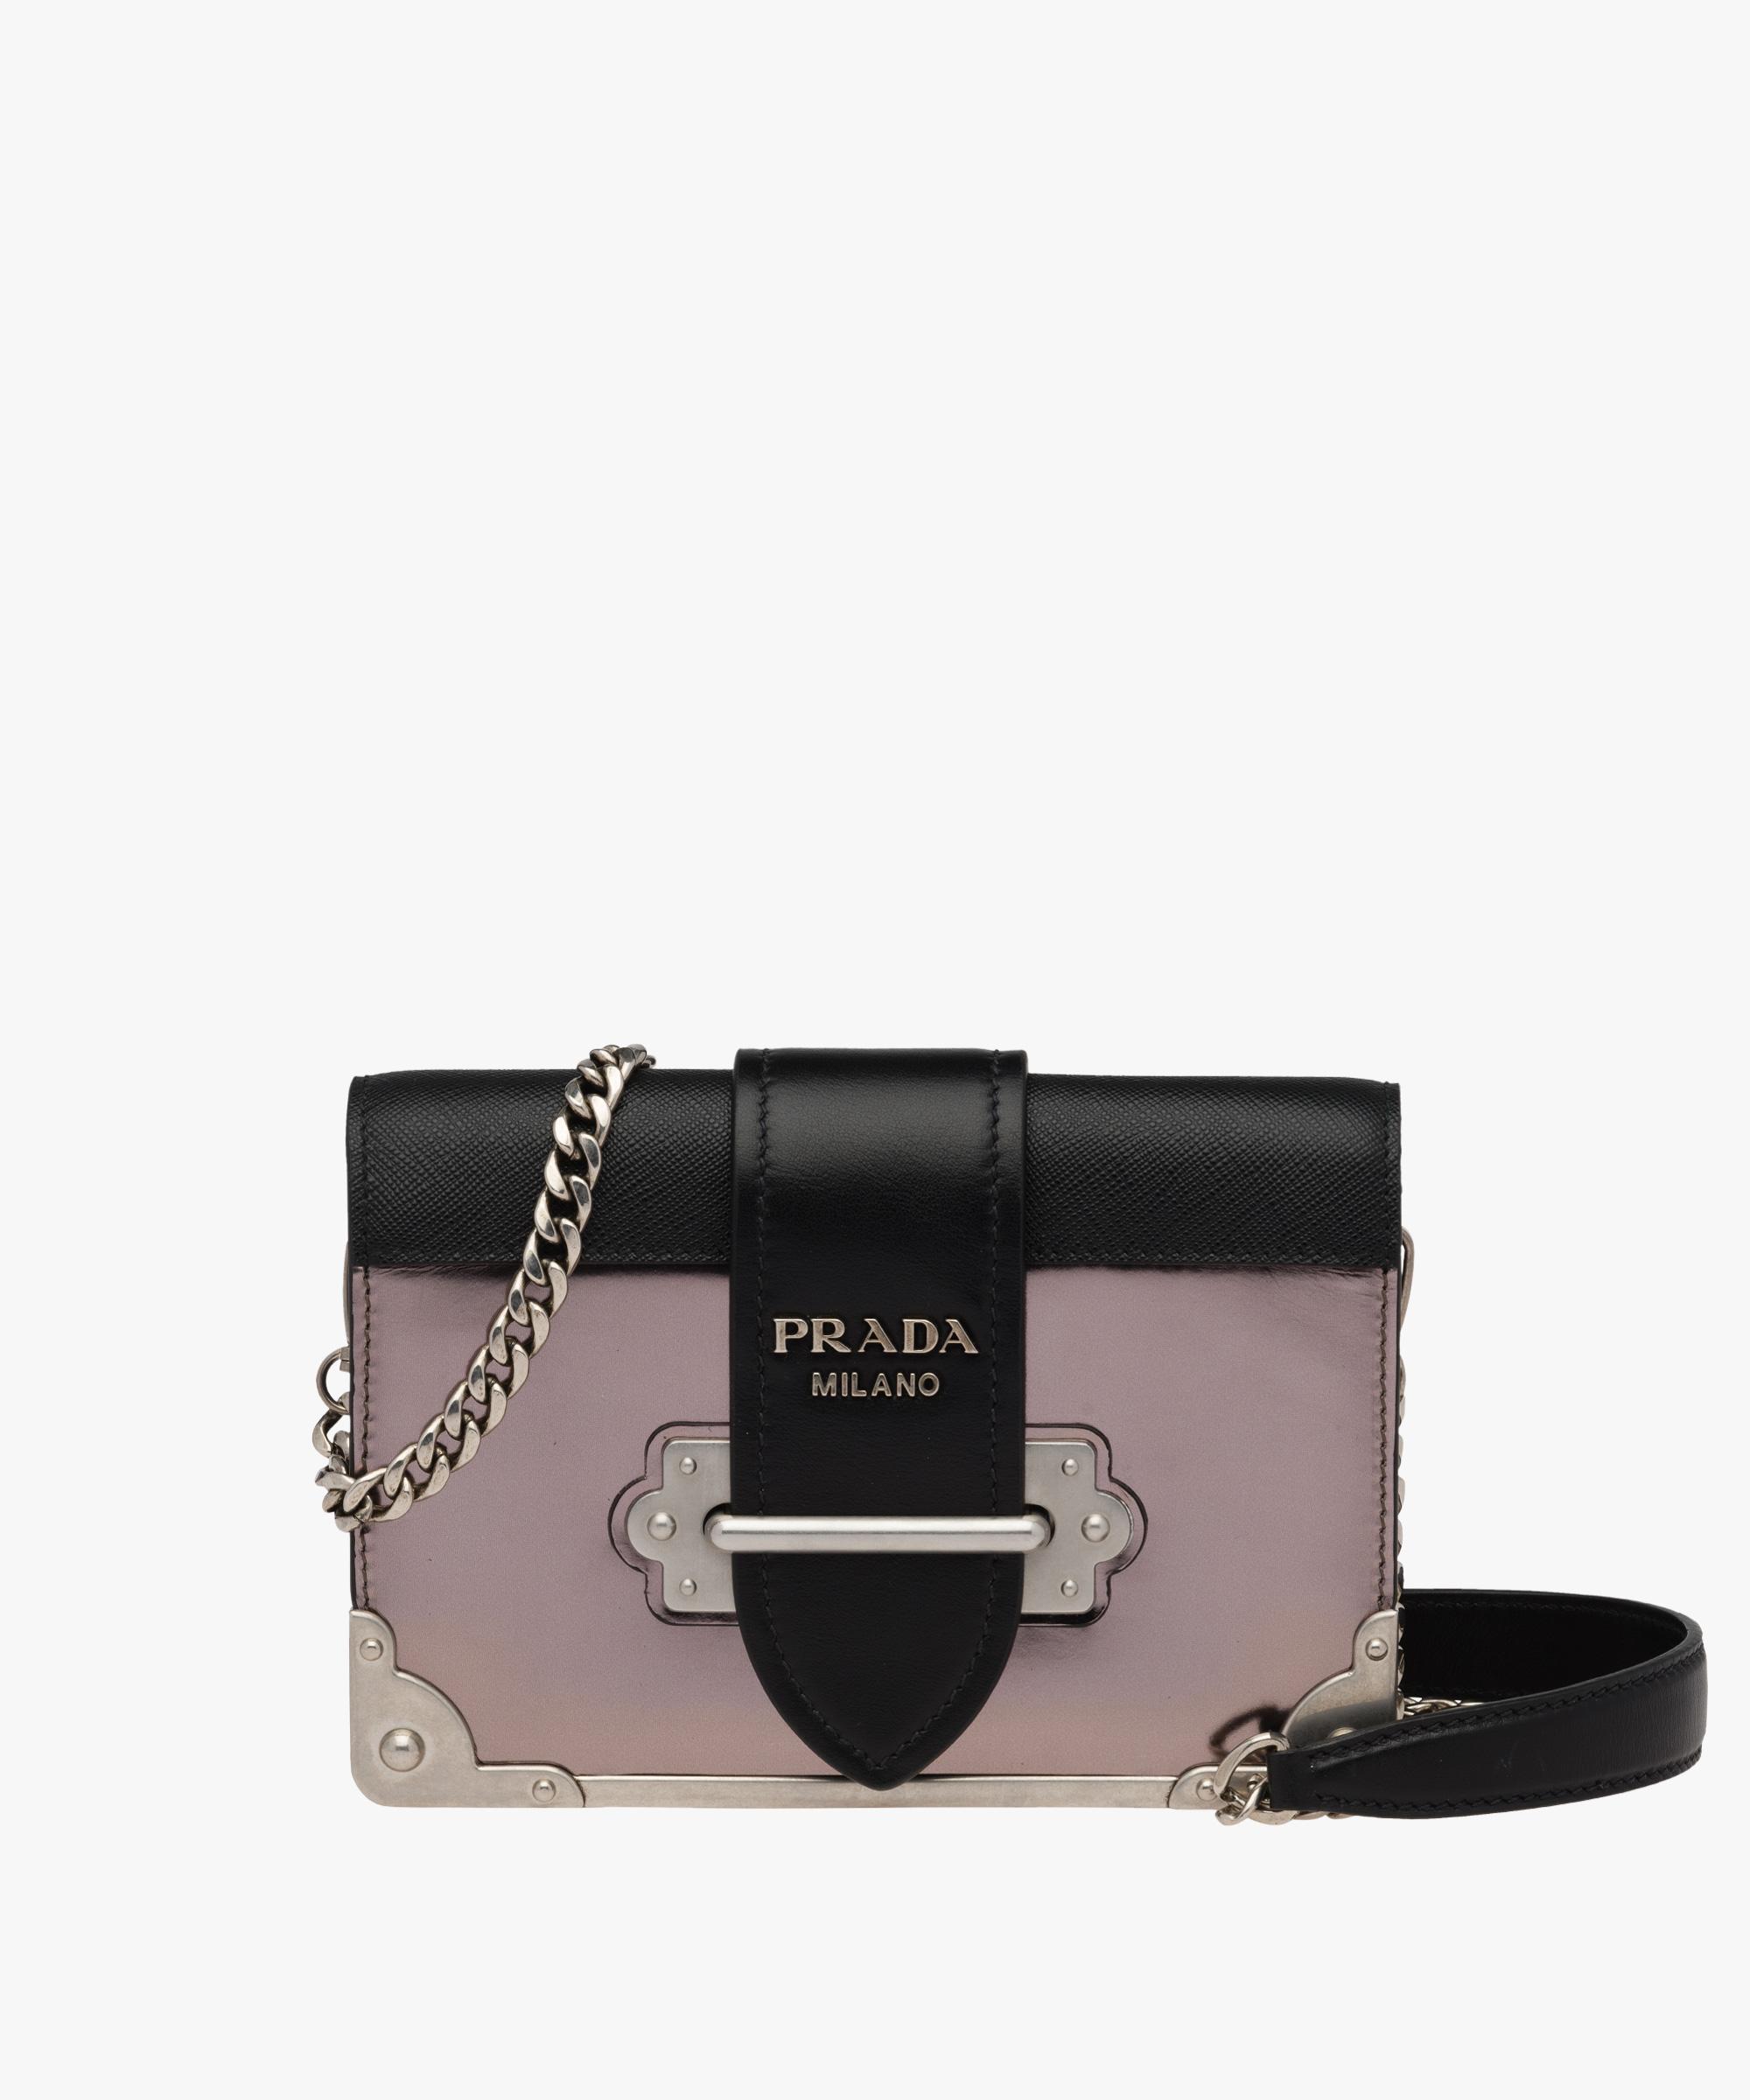 1d3fead91114c ... italy prada cahier leather shoulder bag prada iron gray black 995ce  a2bf2